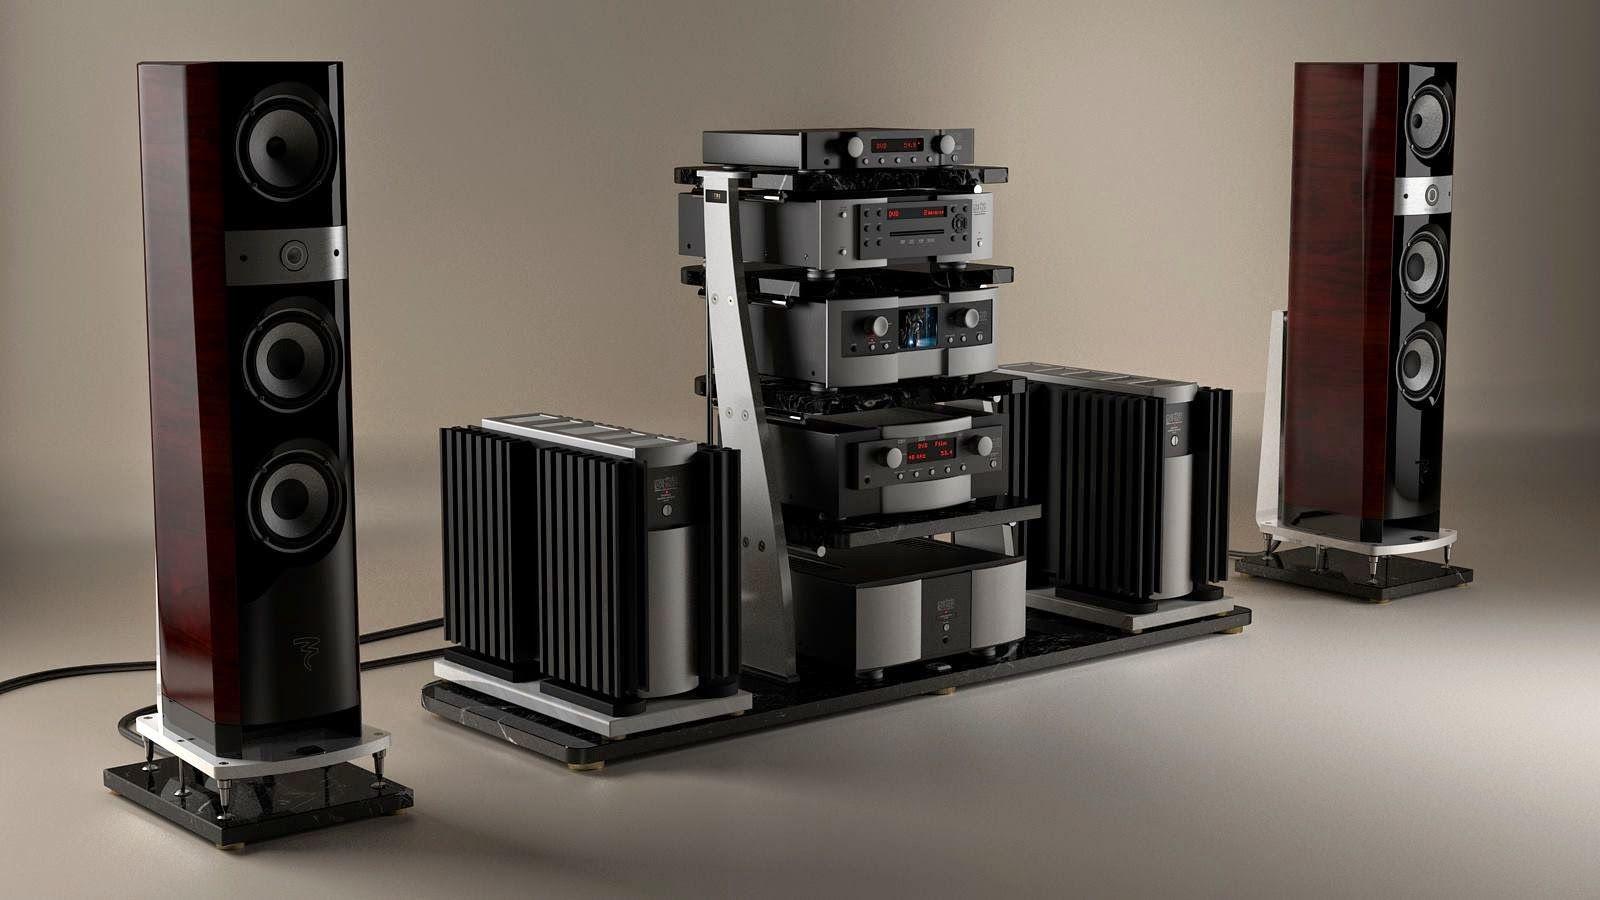 JTL Audio STB2 audio rack system   02 Things passions Hi ...